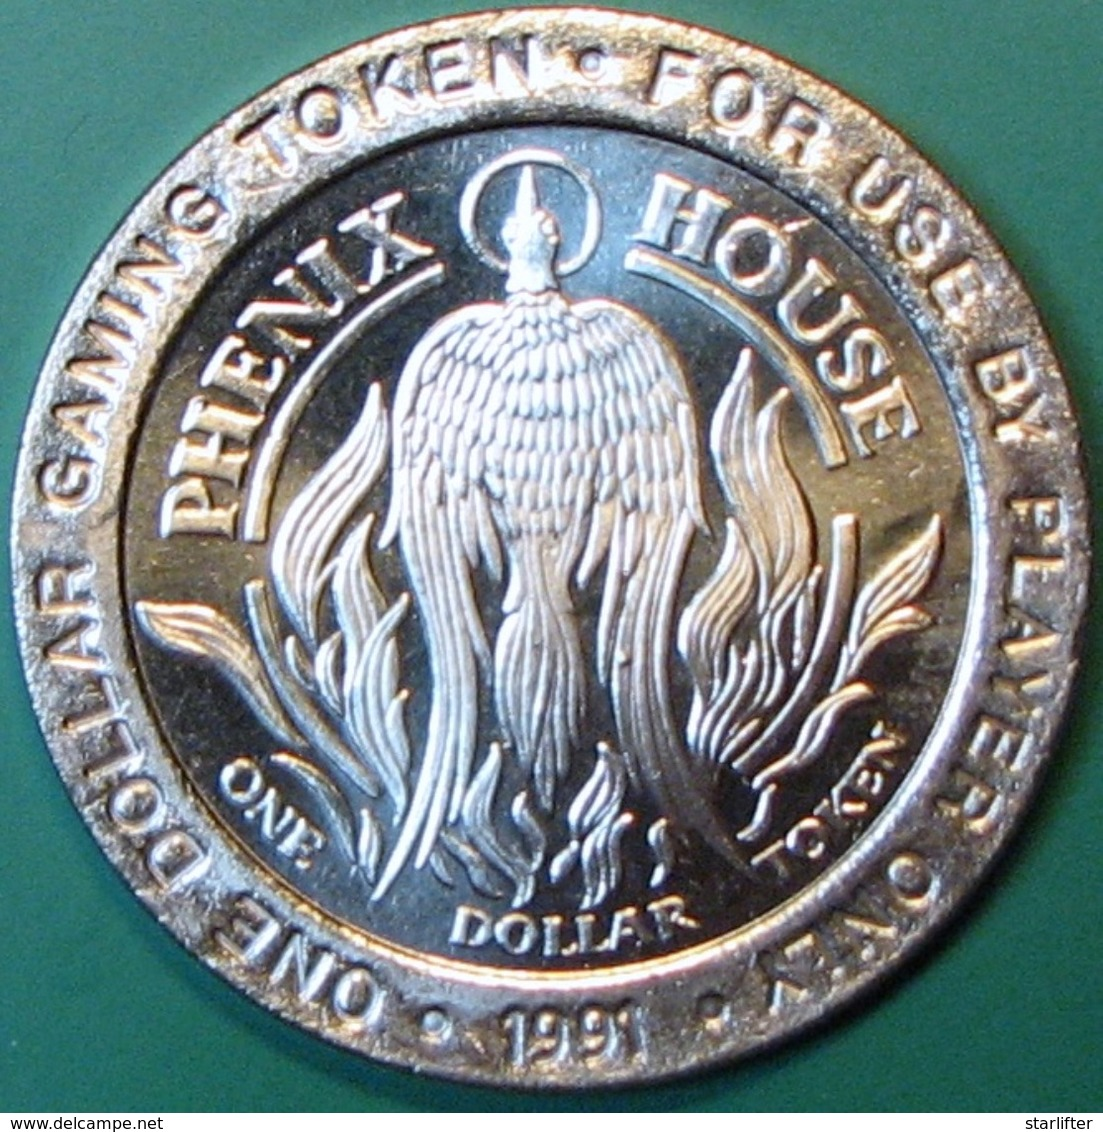 $1 Casino Token. Phenix House, Cripple Creek, CO. 1991. NEW. J32. - Casino